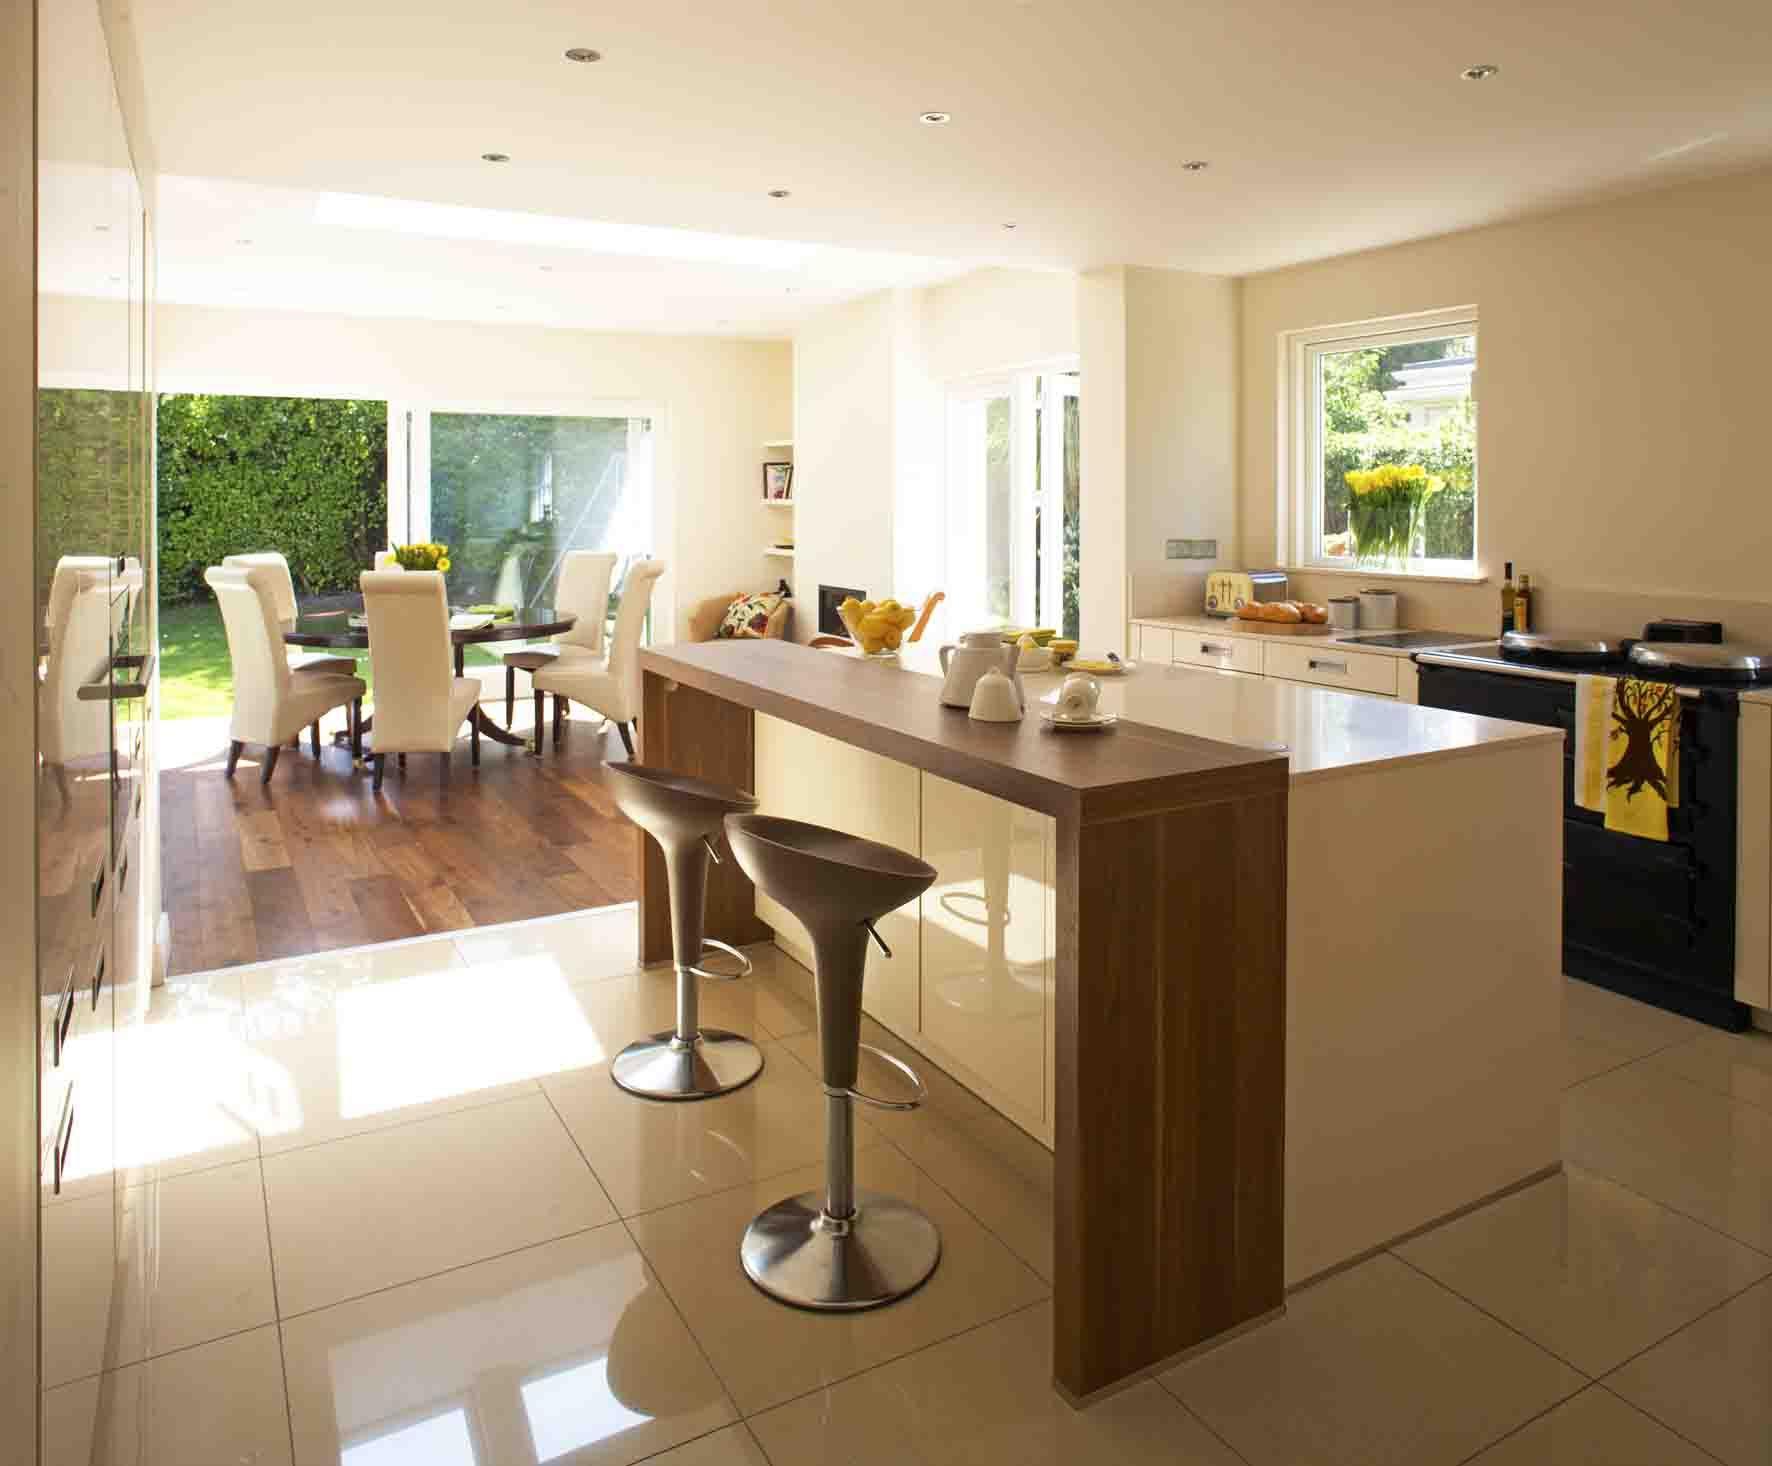 kitchen breakfast bar stools contemporary faucets best 25 43 wooden ideas on pinterest